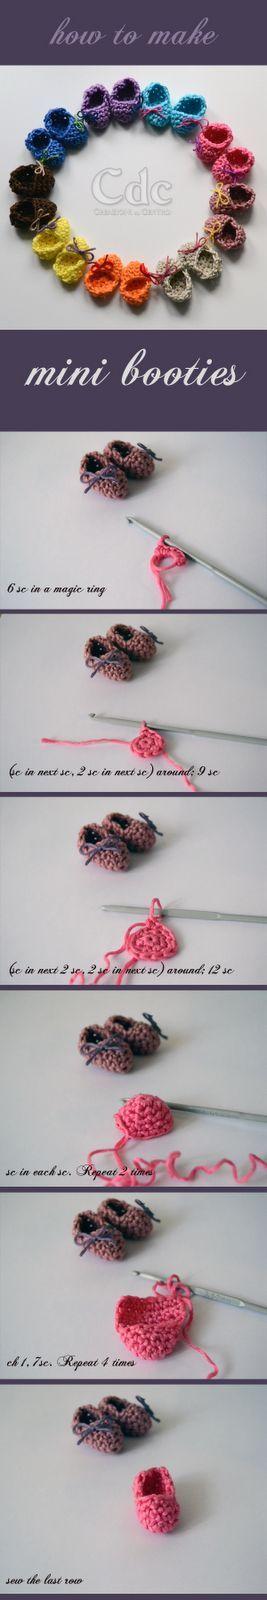 Crochet Mini Booties - Photo Tutorial ❥ 4U / /hf: